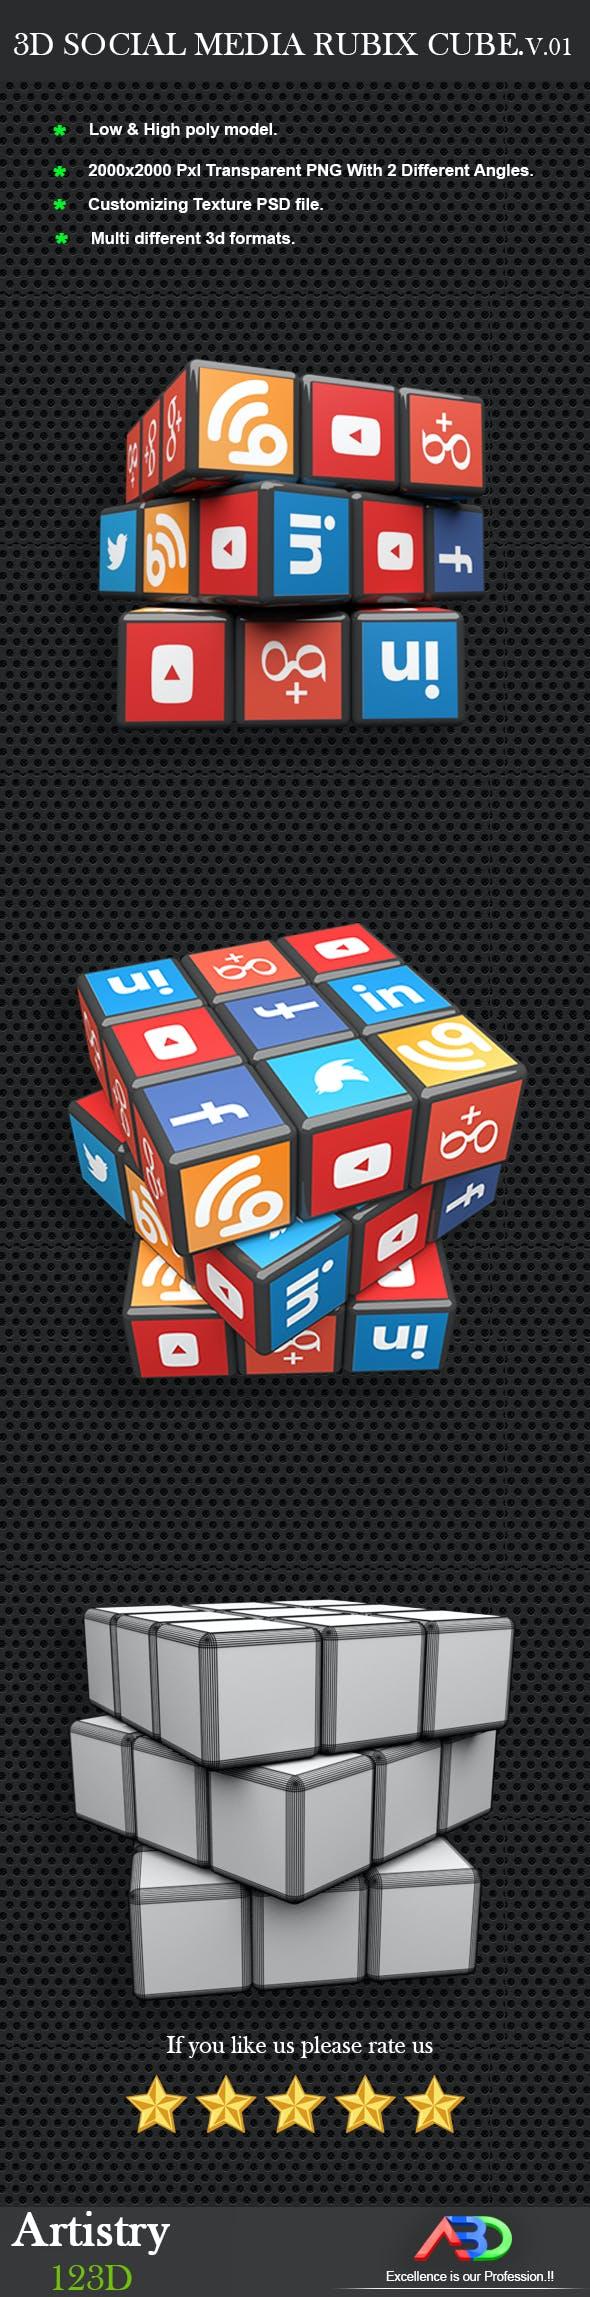 Social media 3D rubix cube - 3DOcean Item for Sale